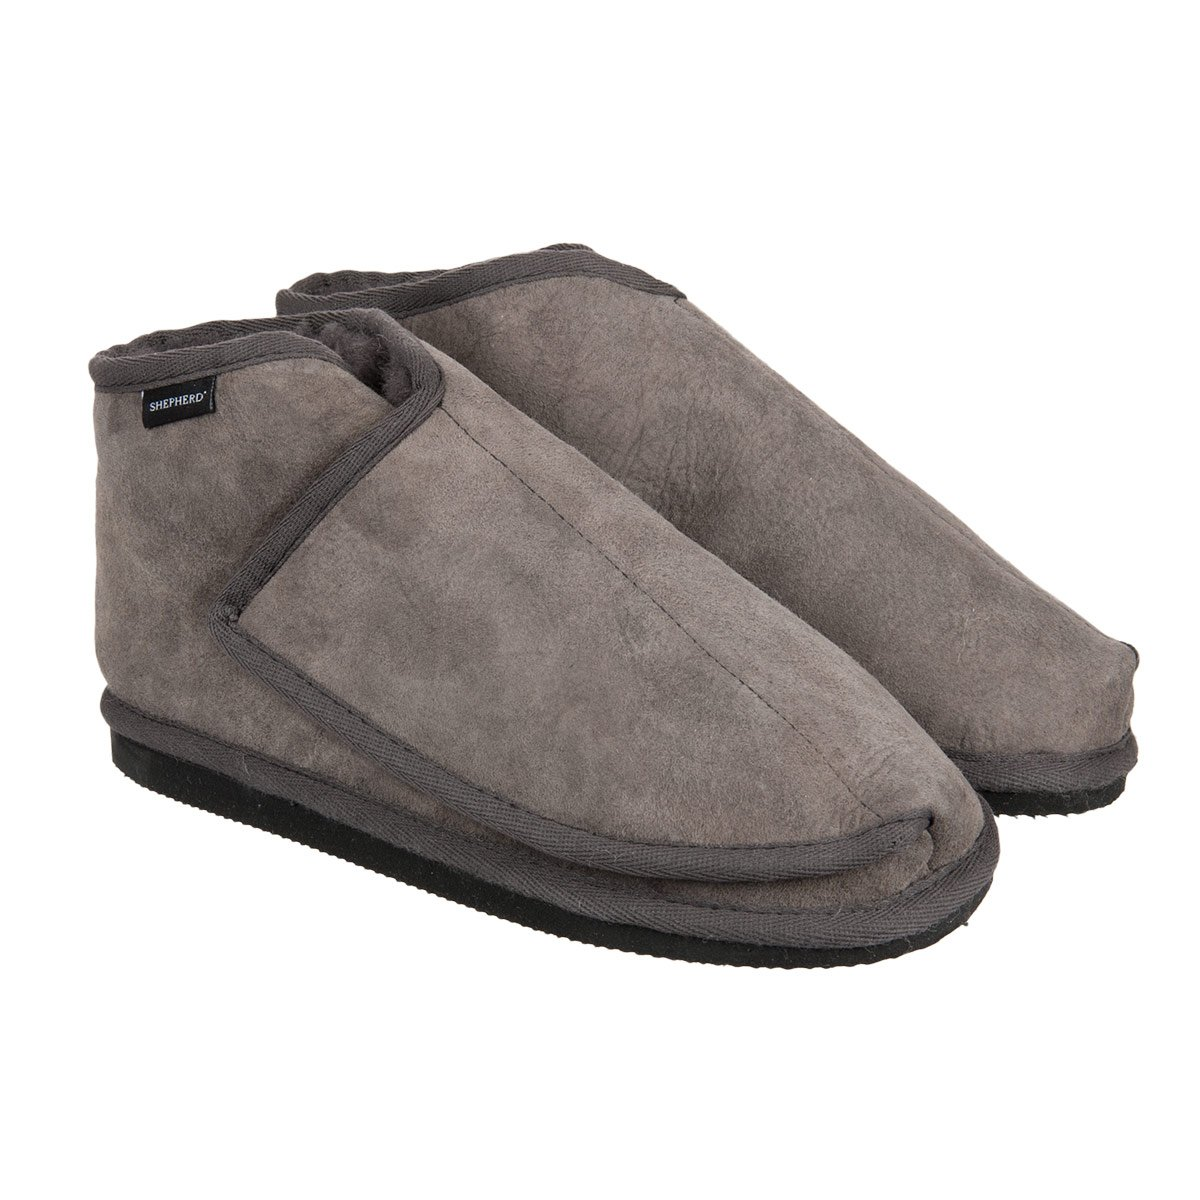 31087c4c0 Slippers in sheepskin by Denise Shepherd with wide entrance